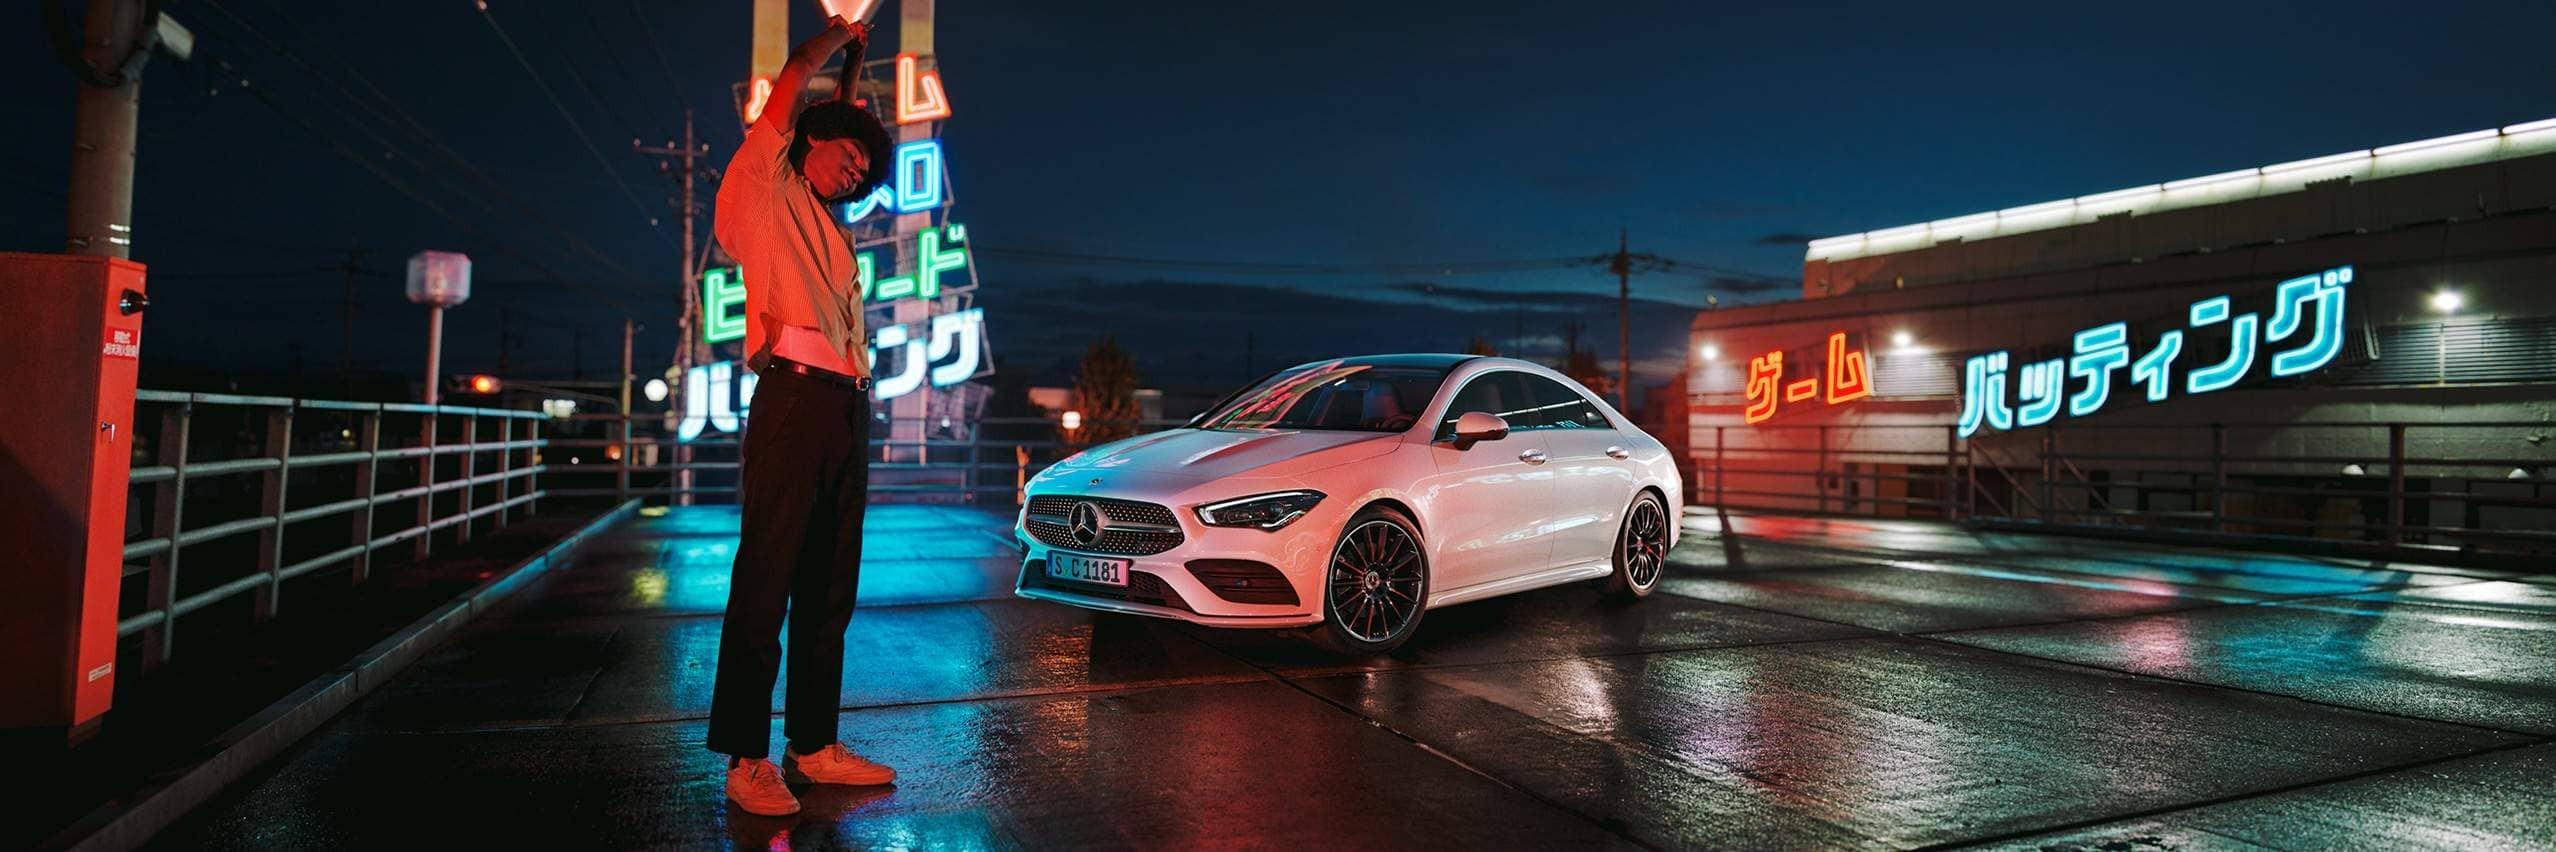 ДизайнMercedes–Benz CLA Coupe 2020